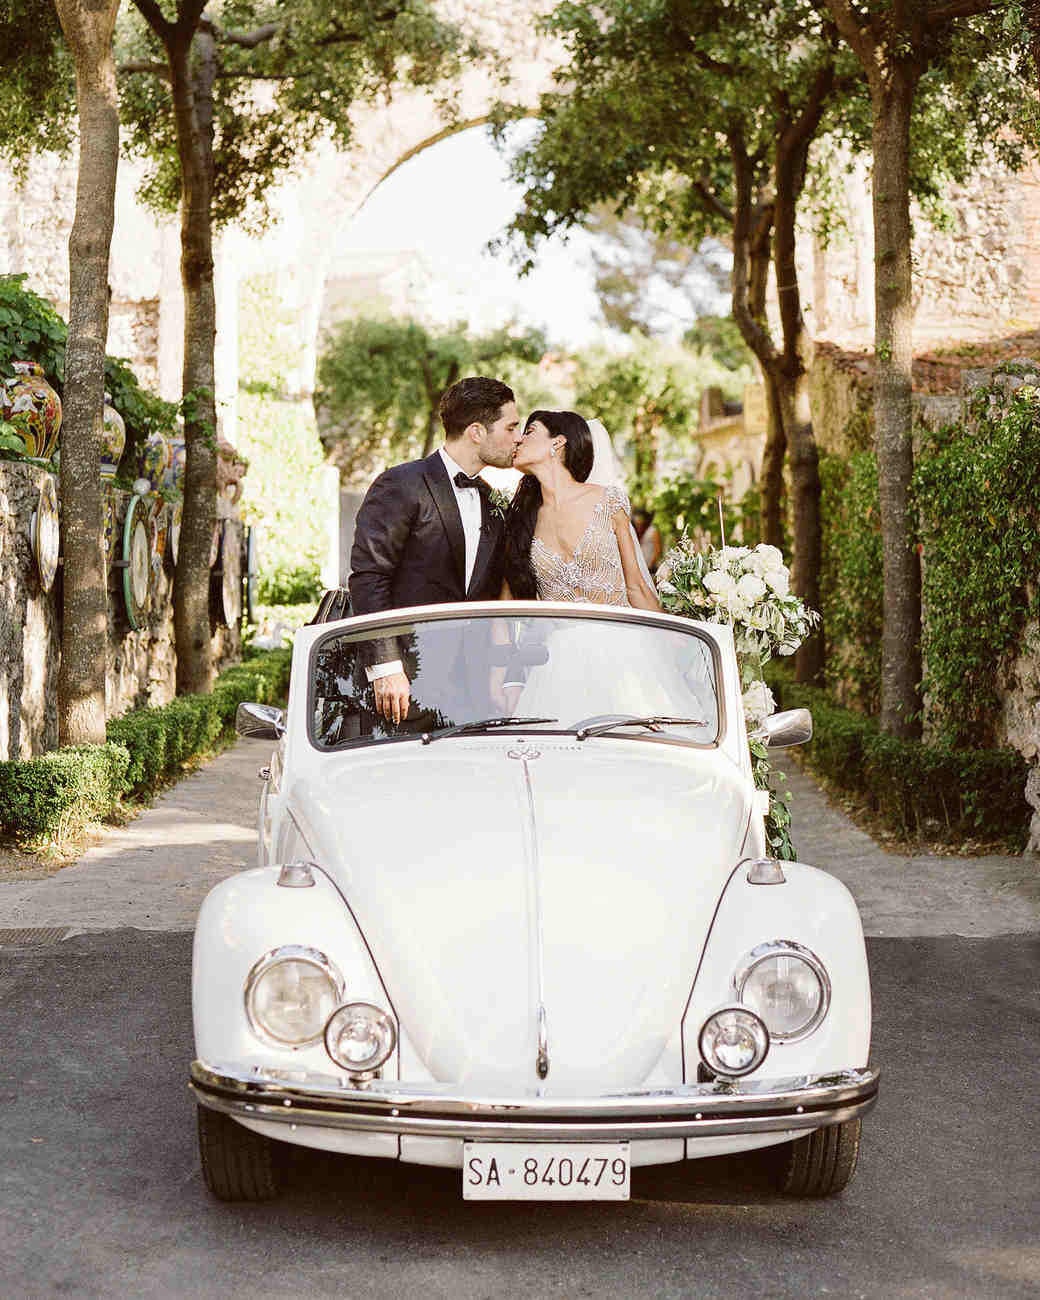 lisa-greg-italy-wedding-car-kiss-103312967_vert.jpg